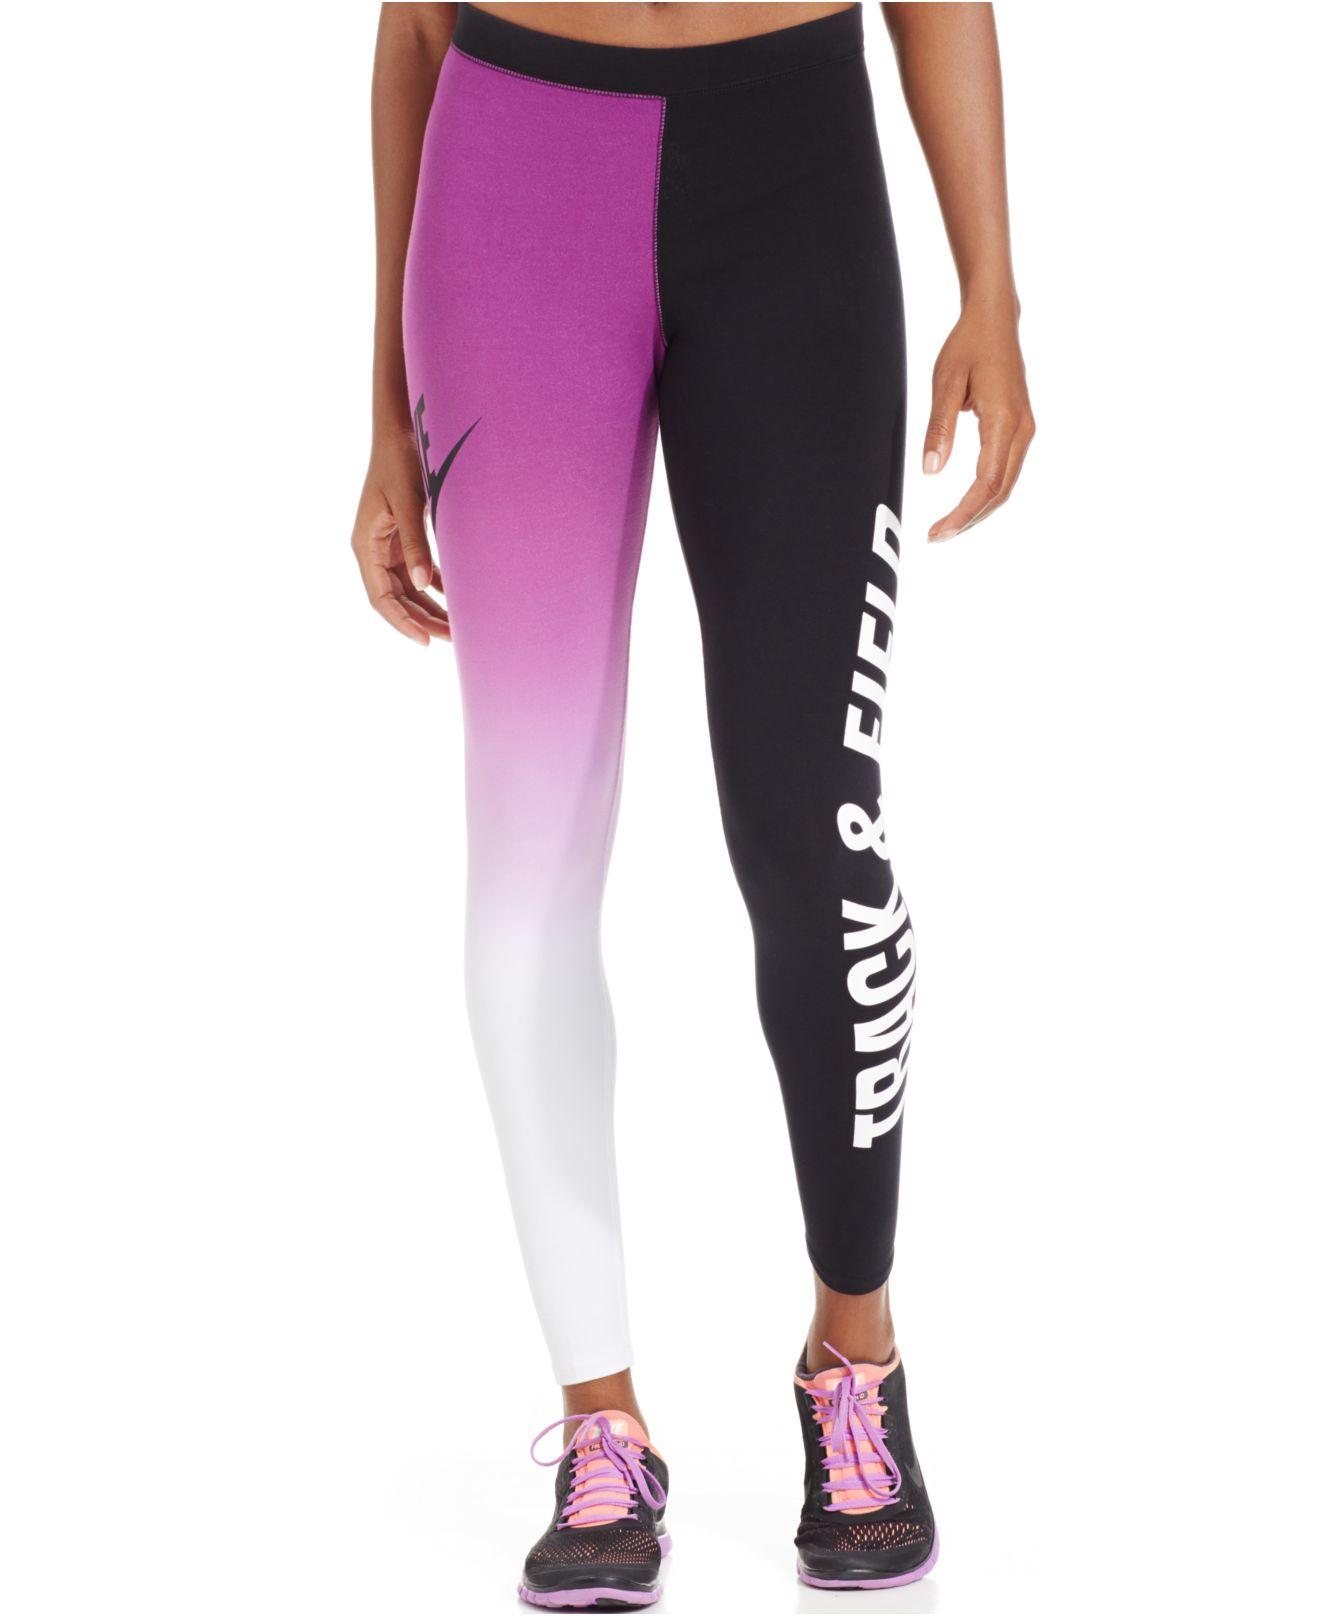 brand new 78088 4eb24 Nike Running Printed Leggings in White - Lyst